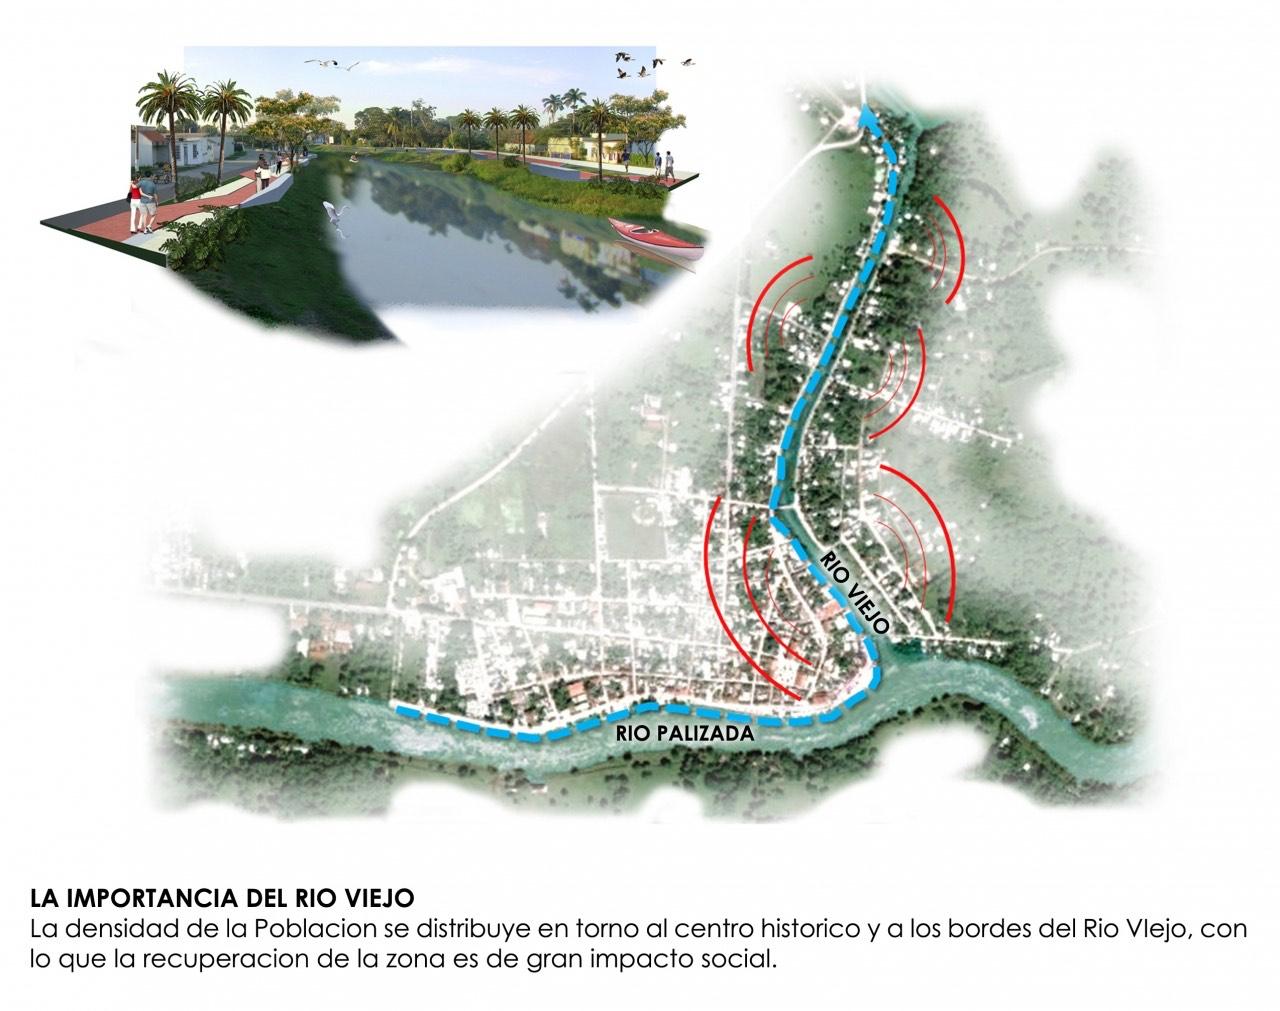 238_image_BIENAL R3 – LAMINA BIENAL PASEO RIO VIEJO 01B-squashed